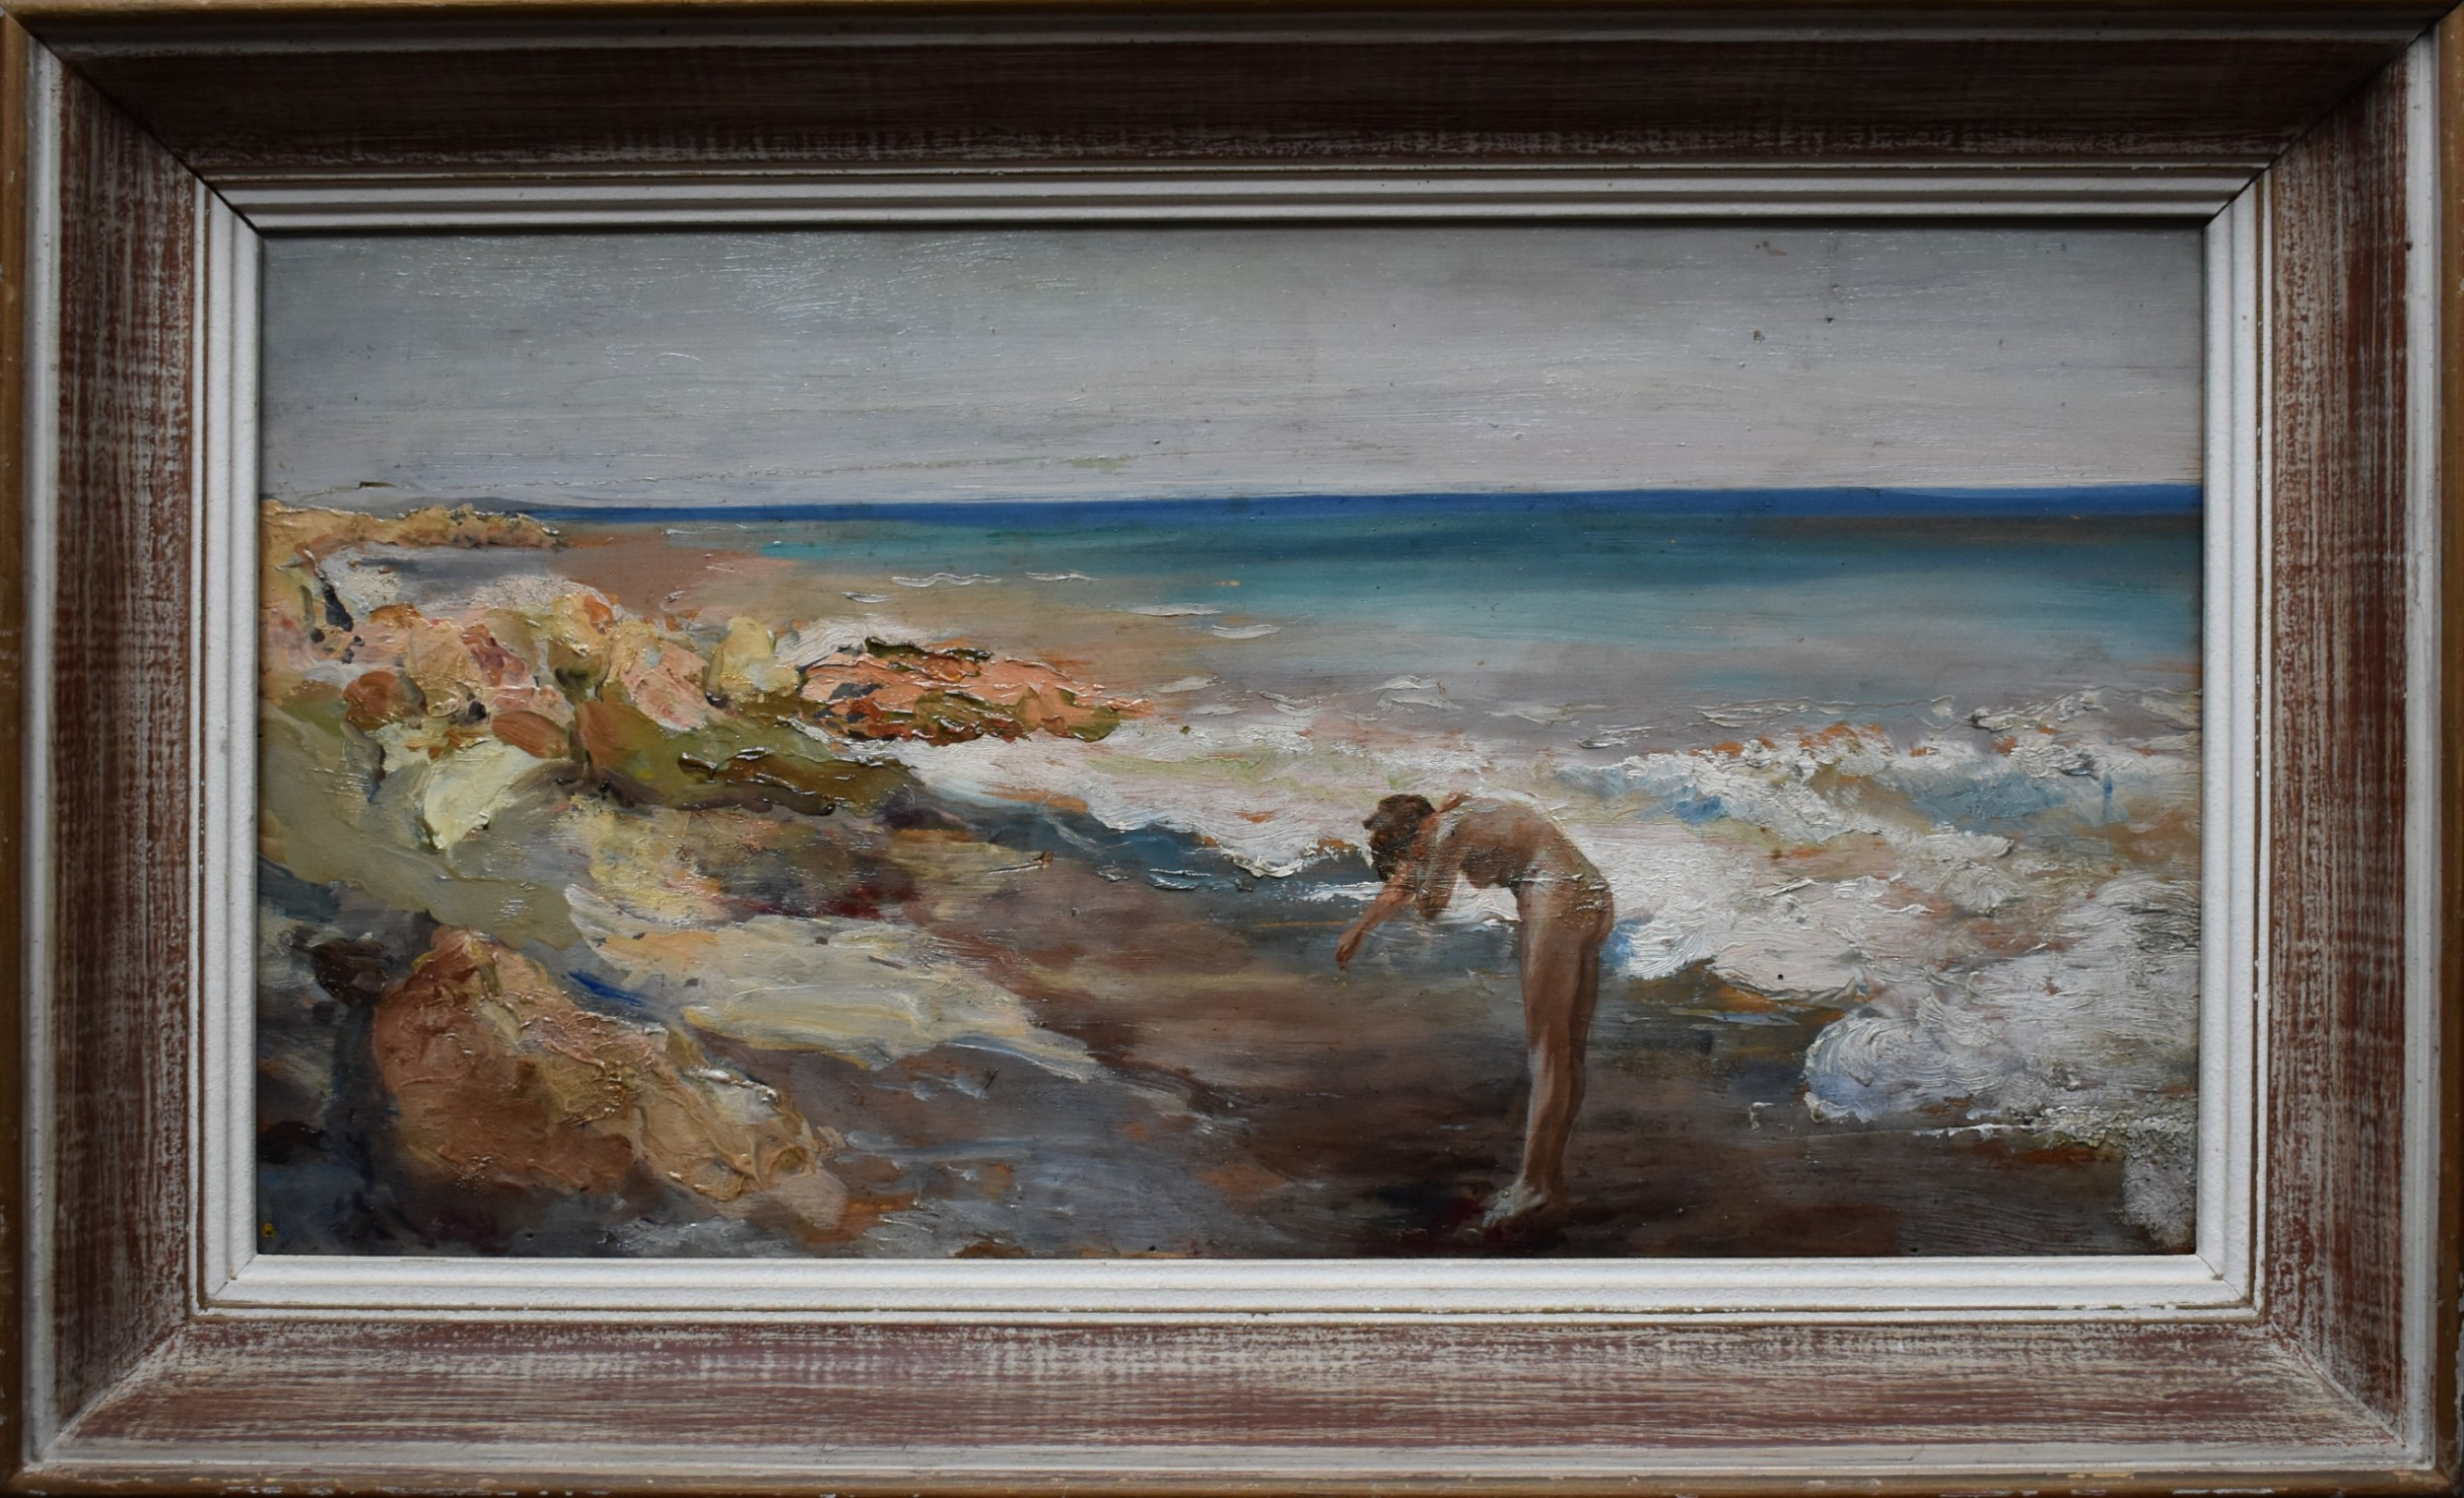 attributed to guglielmo pizzirani 18861971 italian school oil painting